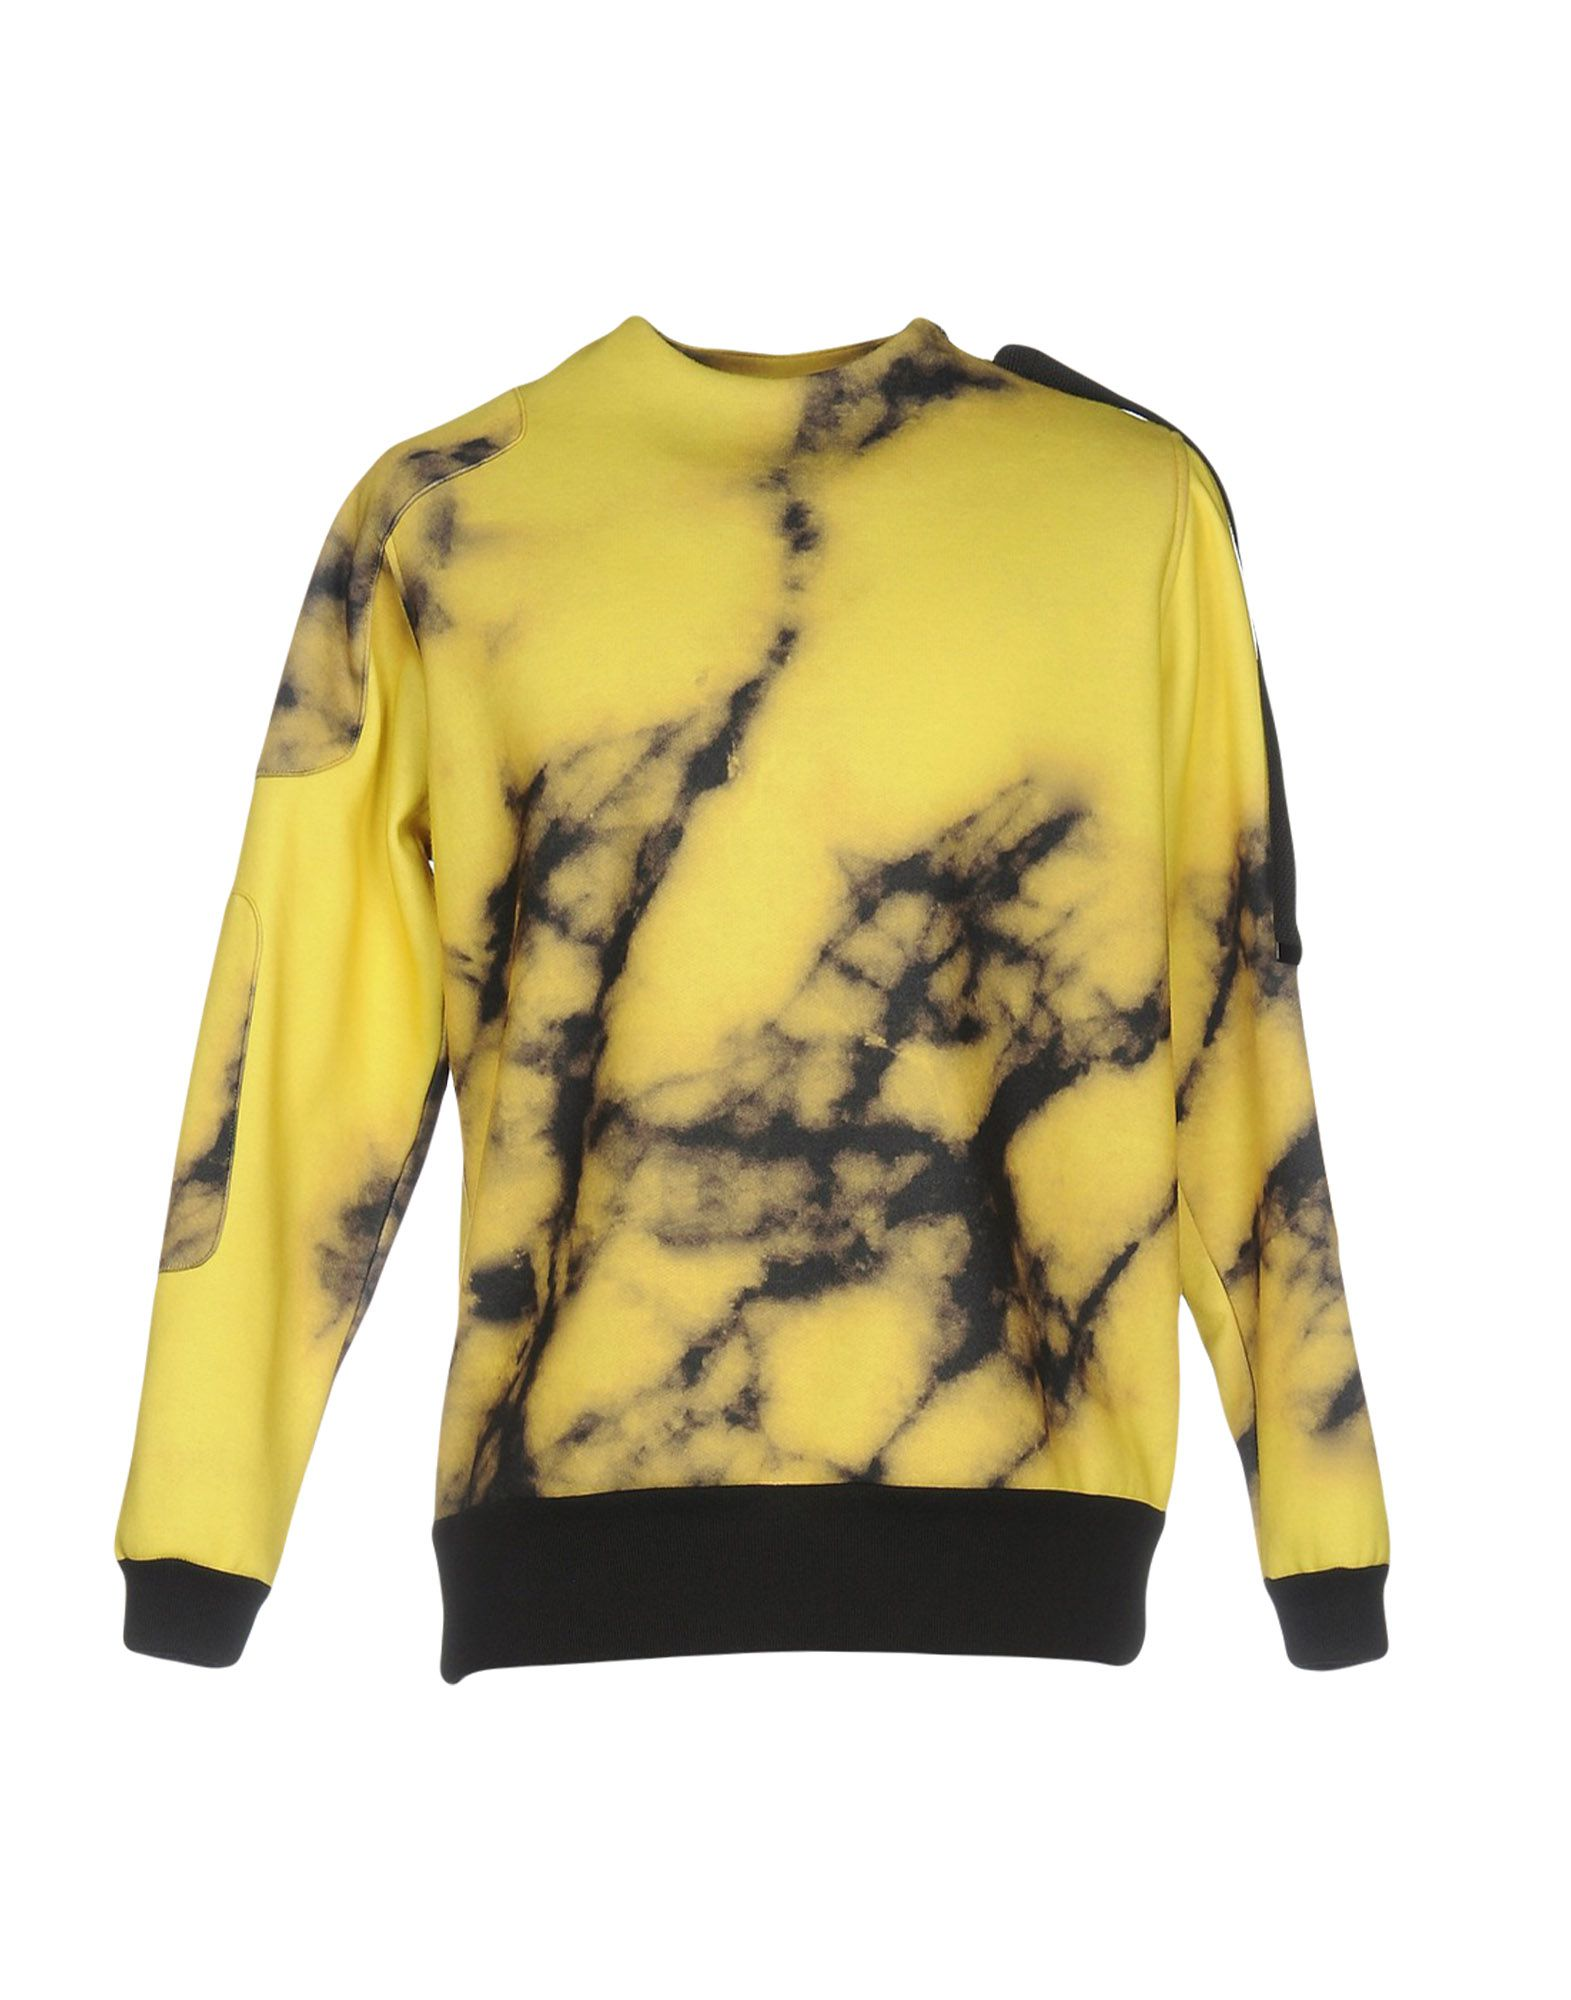 BEENTRILL # Sweatshirts in Yellow